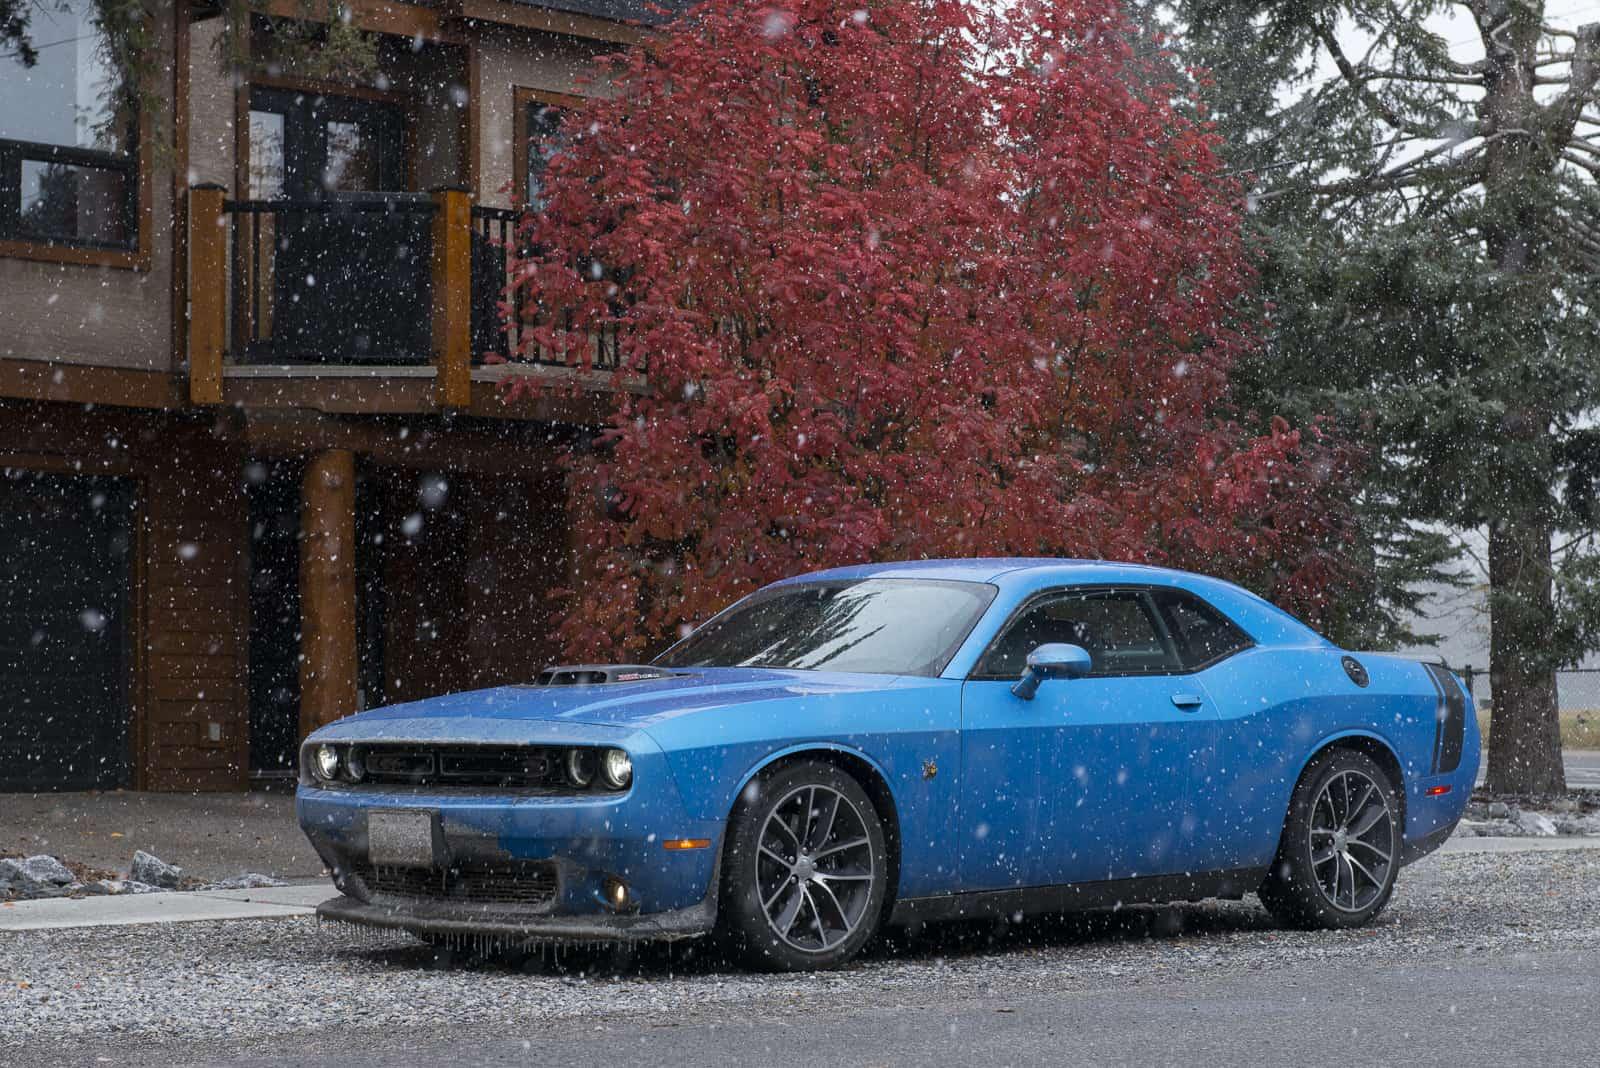 2016 dodge challenger r t scat pack review the 485 hp family car. Black Bedroom Furniture Sets. Home Design Ideas